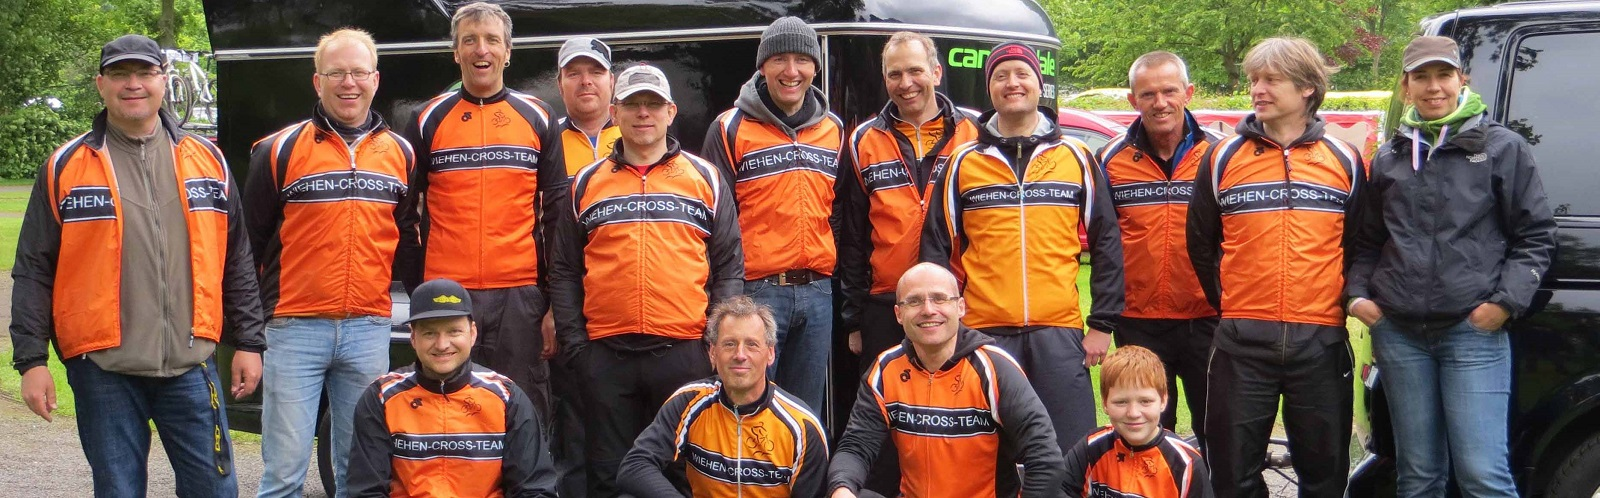 Team Alfsee 2013